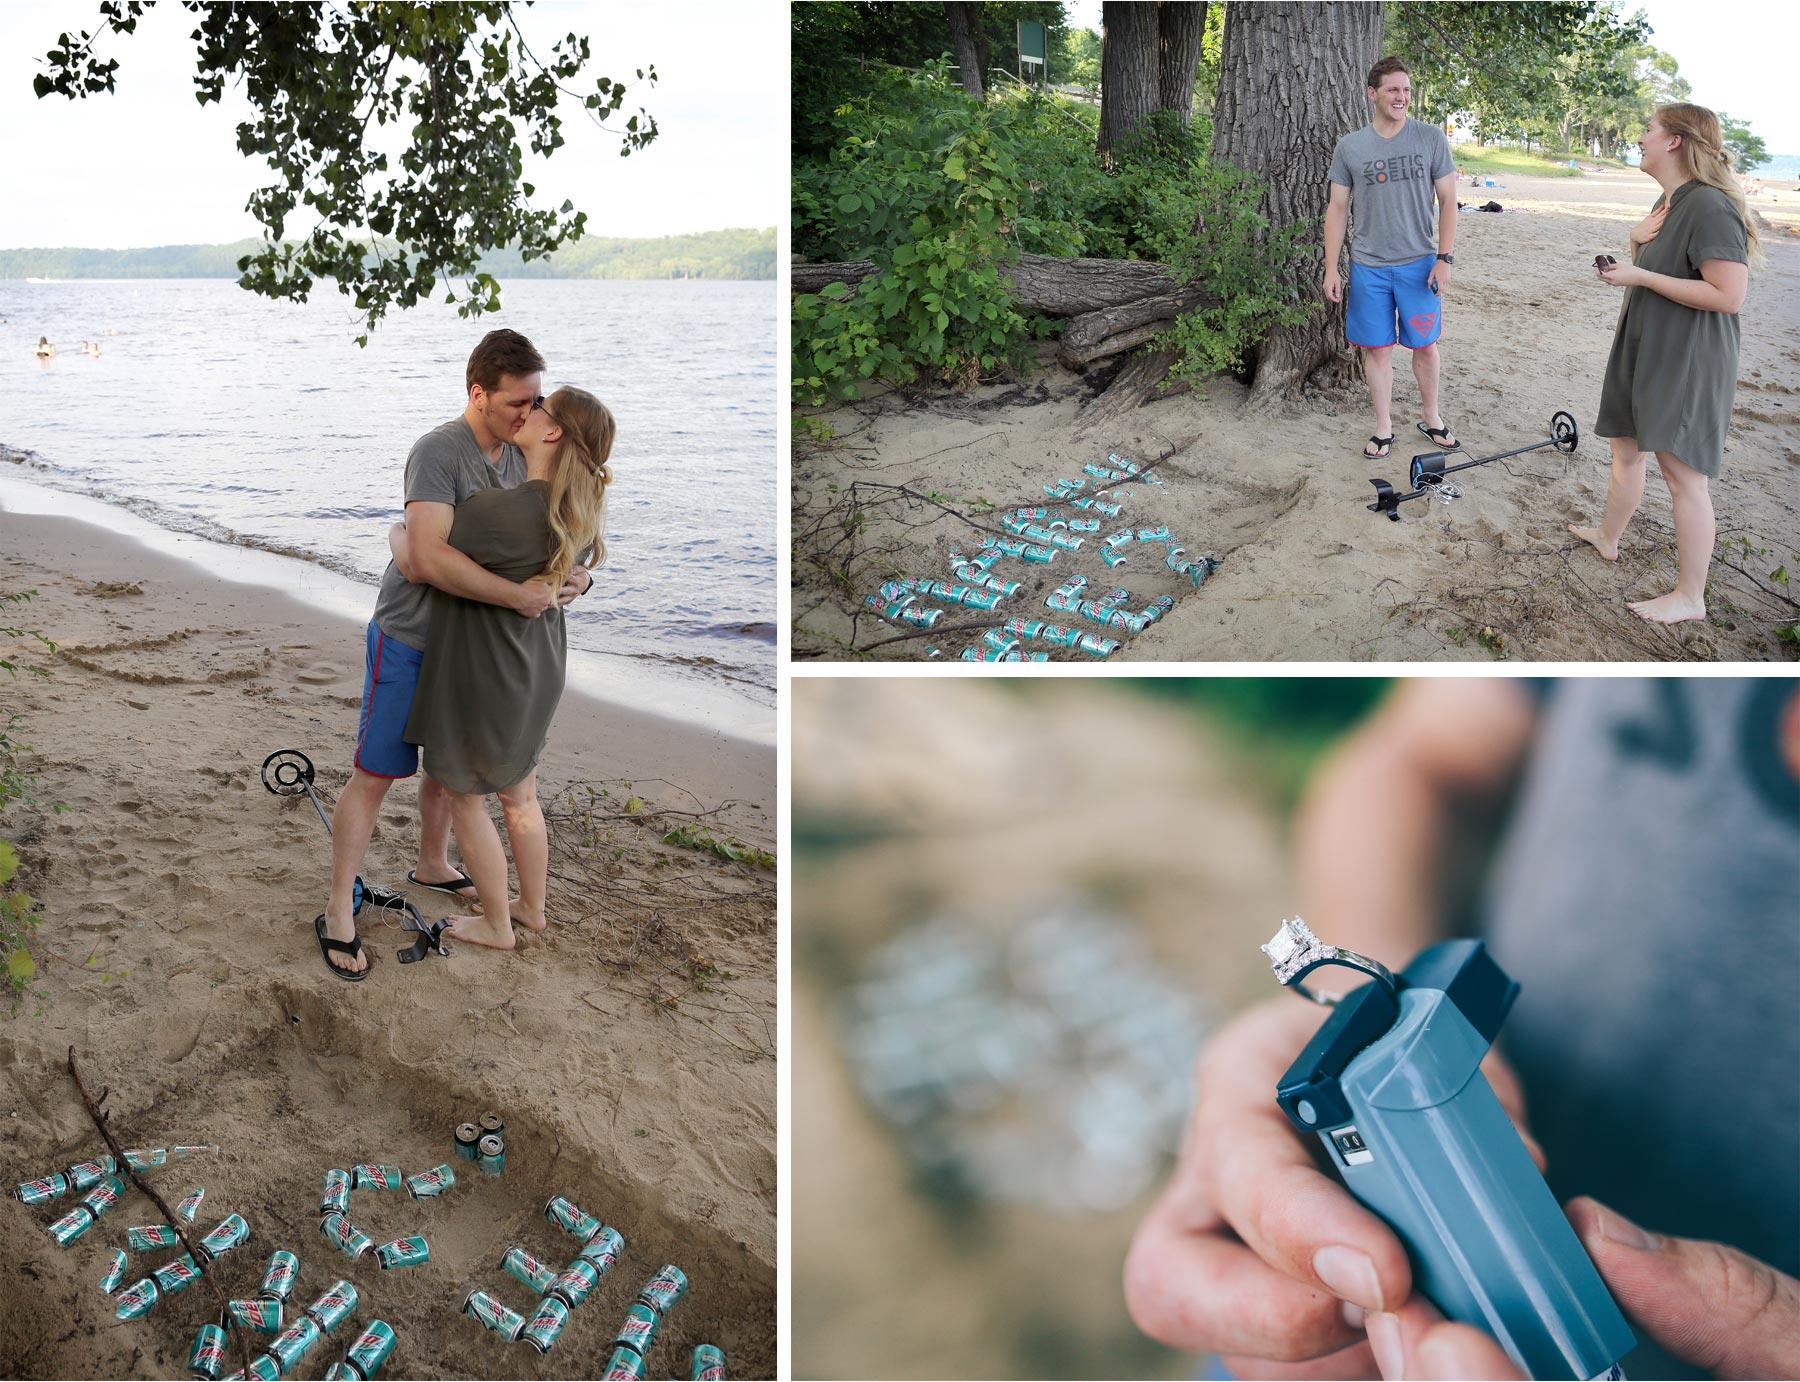 08-Vick-Photography-Proposal-Minnesota-Minneapolis-Beach-Metal-Detectors-Marry-Me-Mountain-Dew-Veronica-and-Tyler.jpg